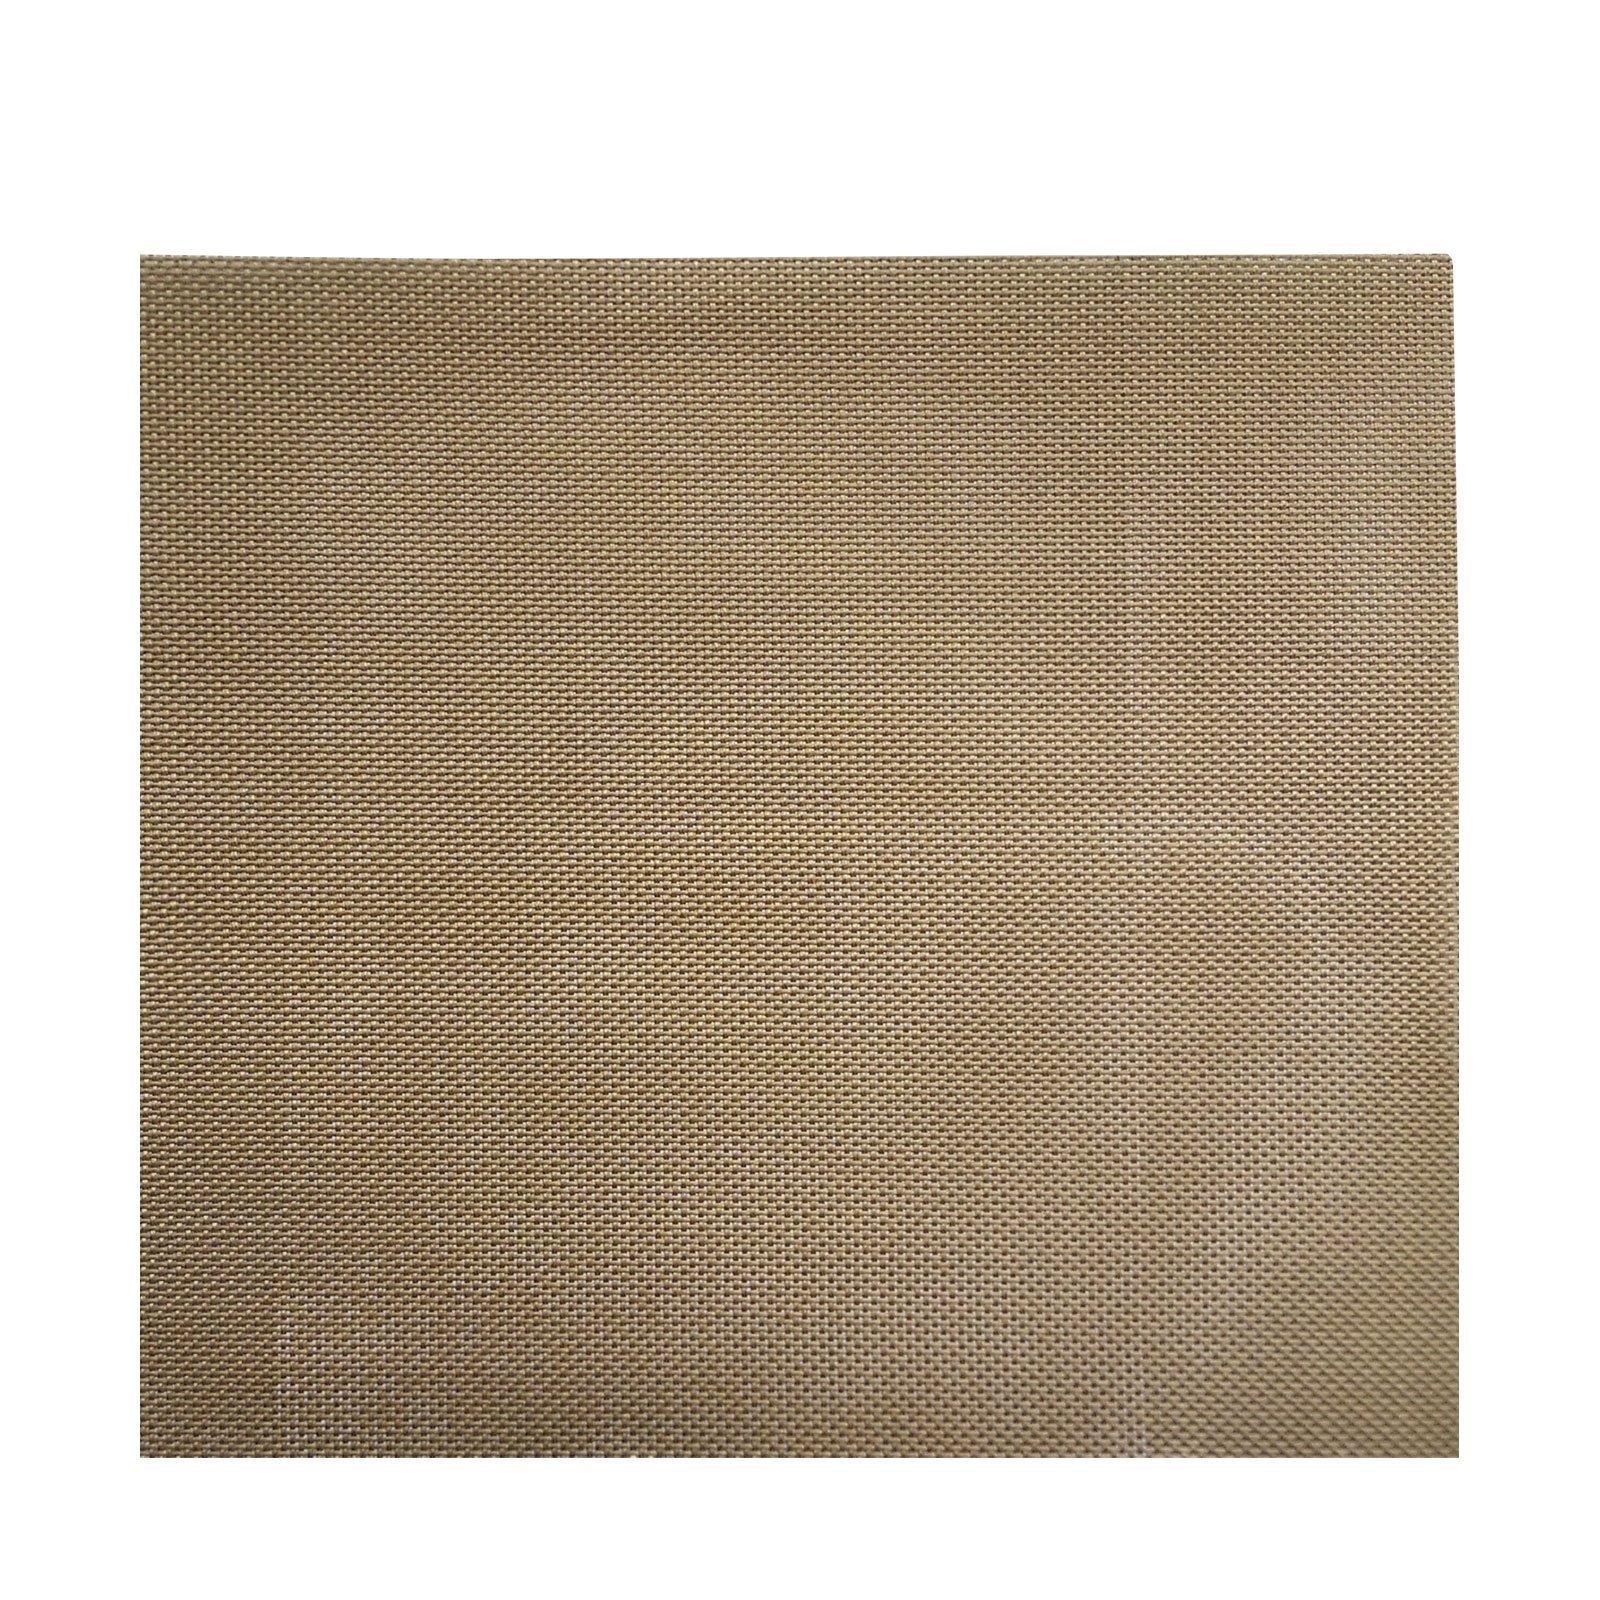 BioChef Arizona 6/9 Tray Mesh Sheet Packs / BPA Free, Mesh Sheets for your Food Dehydrator / Reusable & Washable (2 Packs)